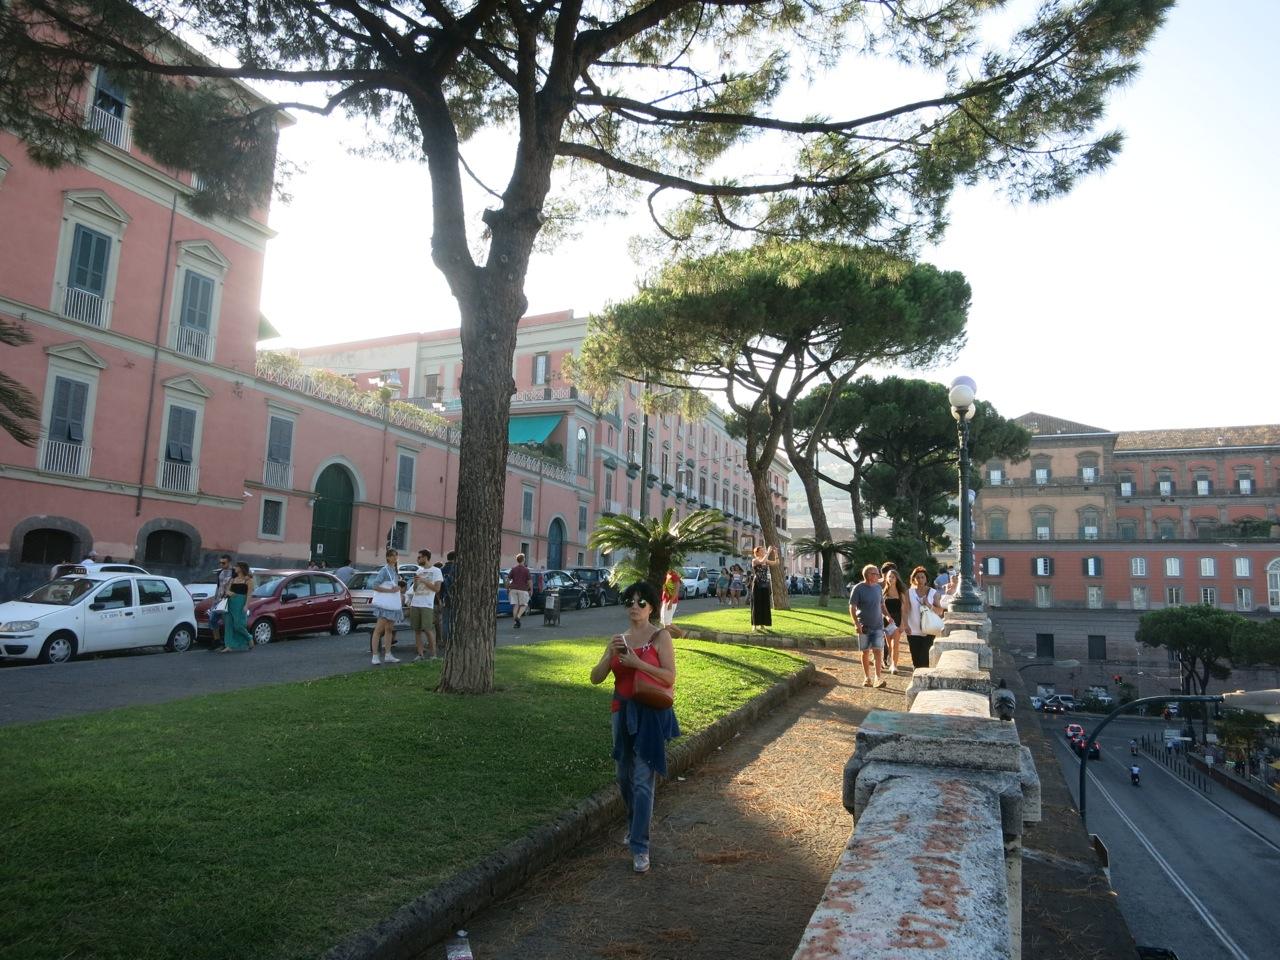 Napoli 1-31